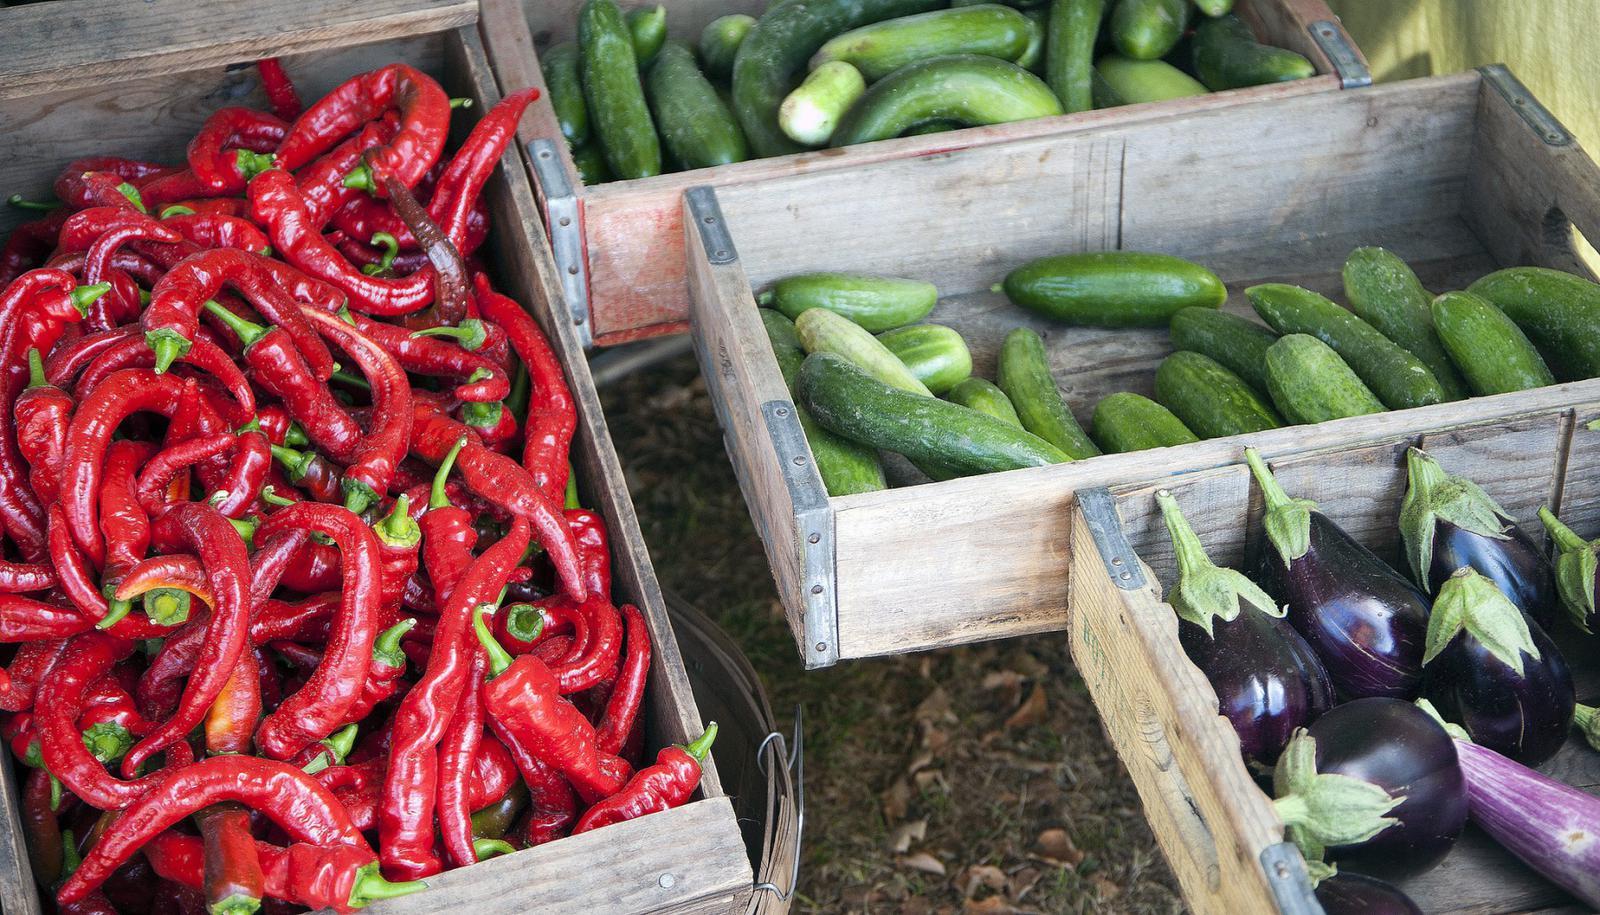 Farmer's Market SLC